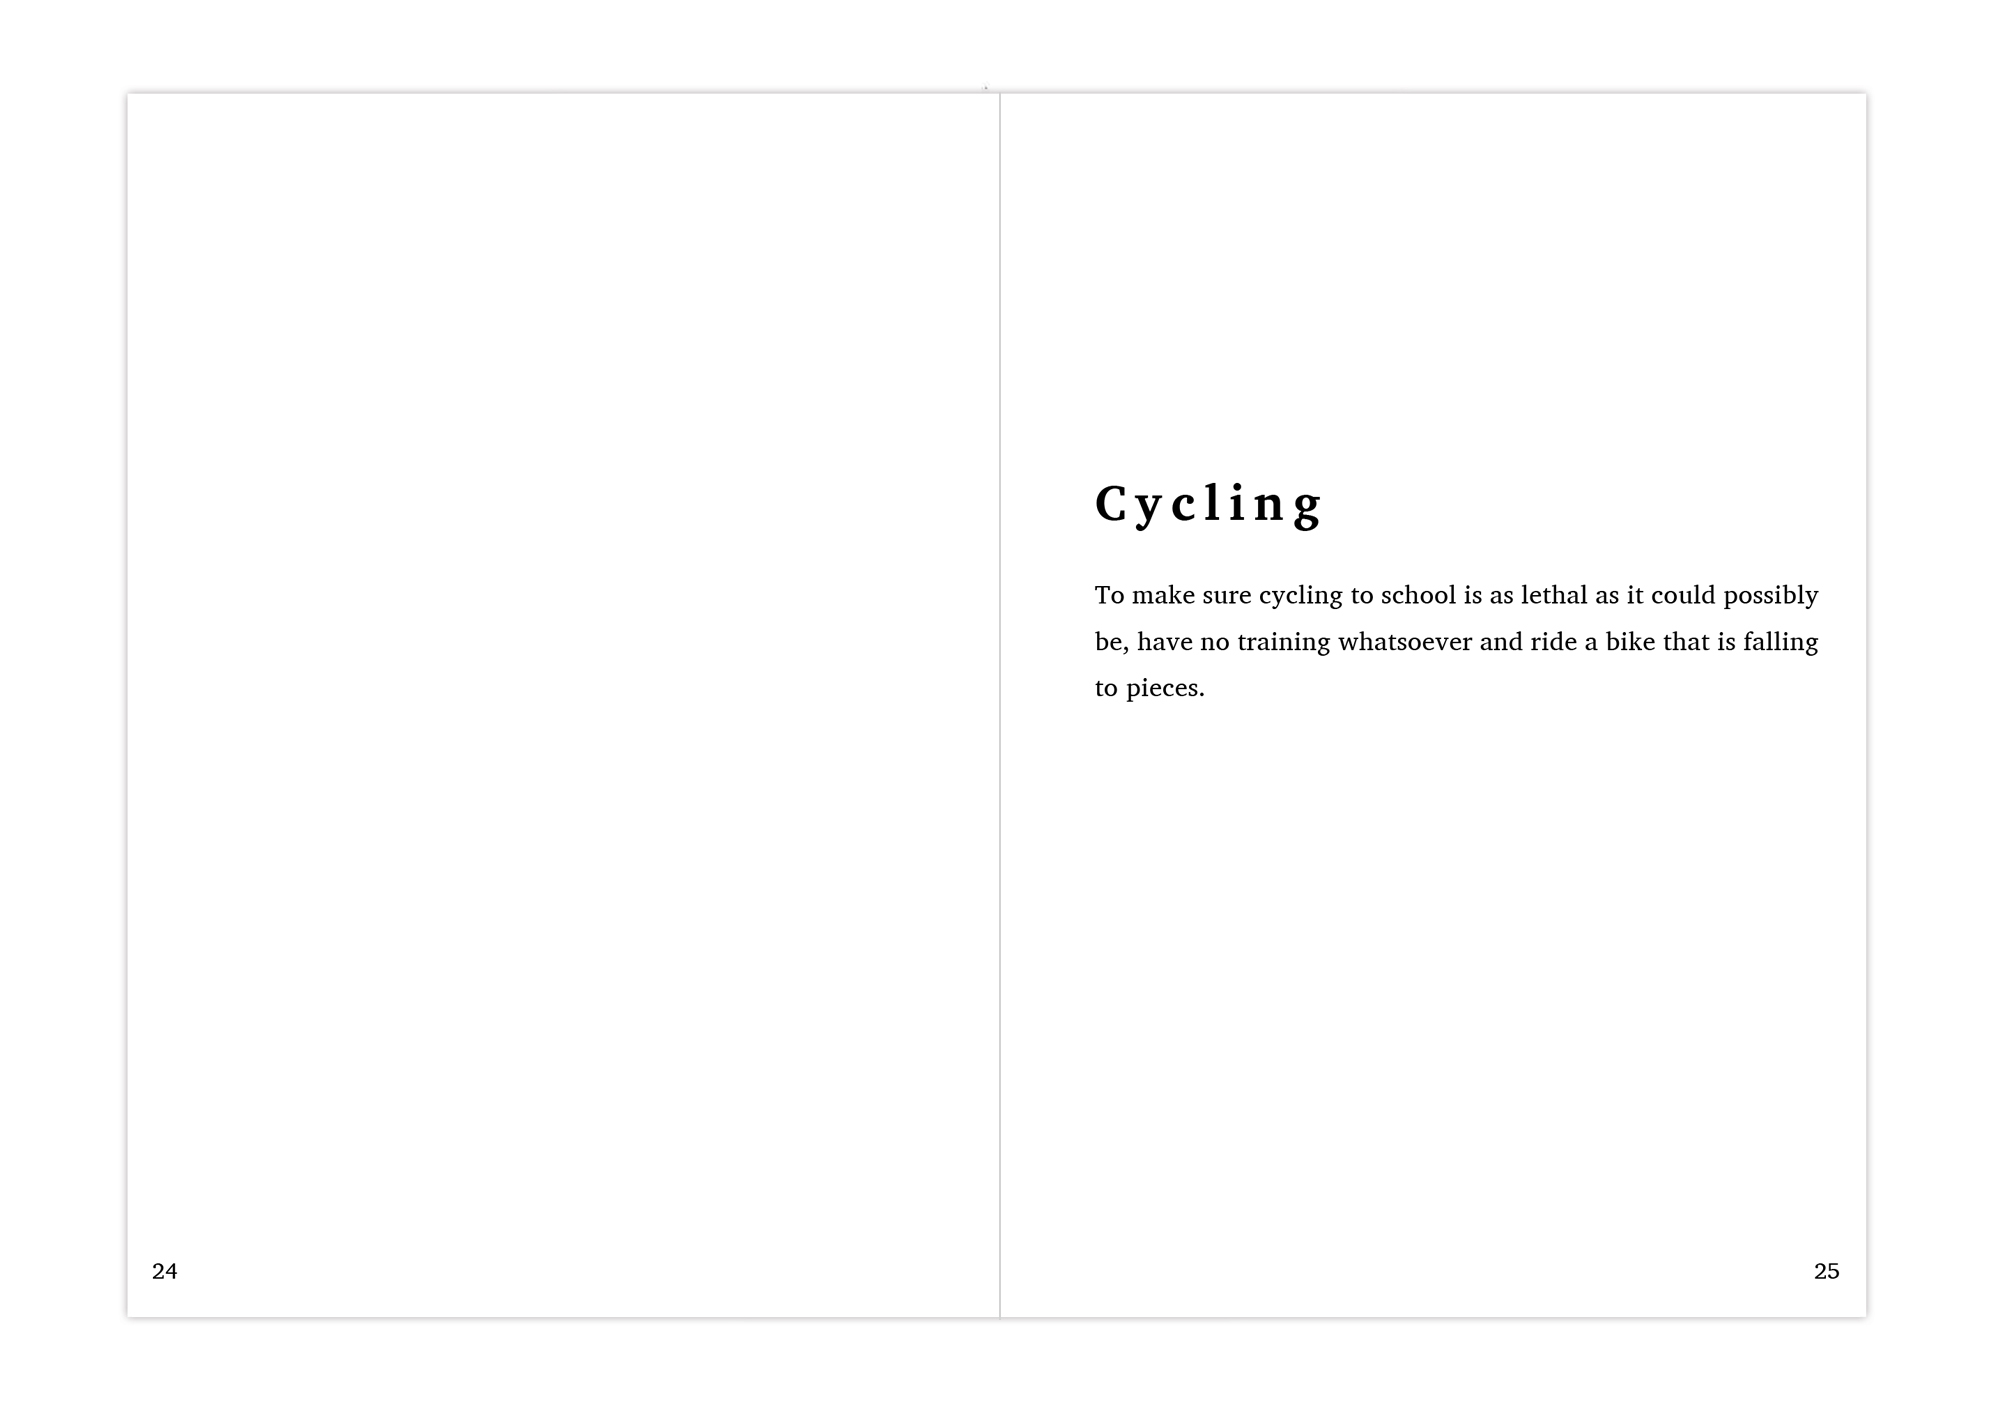 DG-spread-cycling.jpg